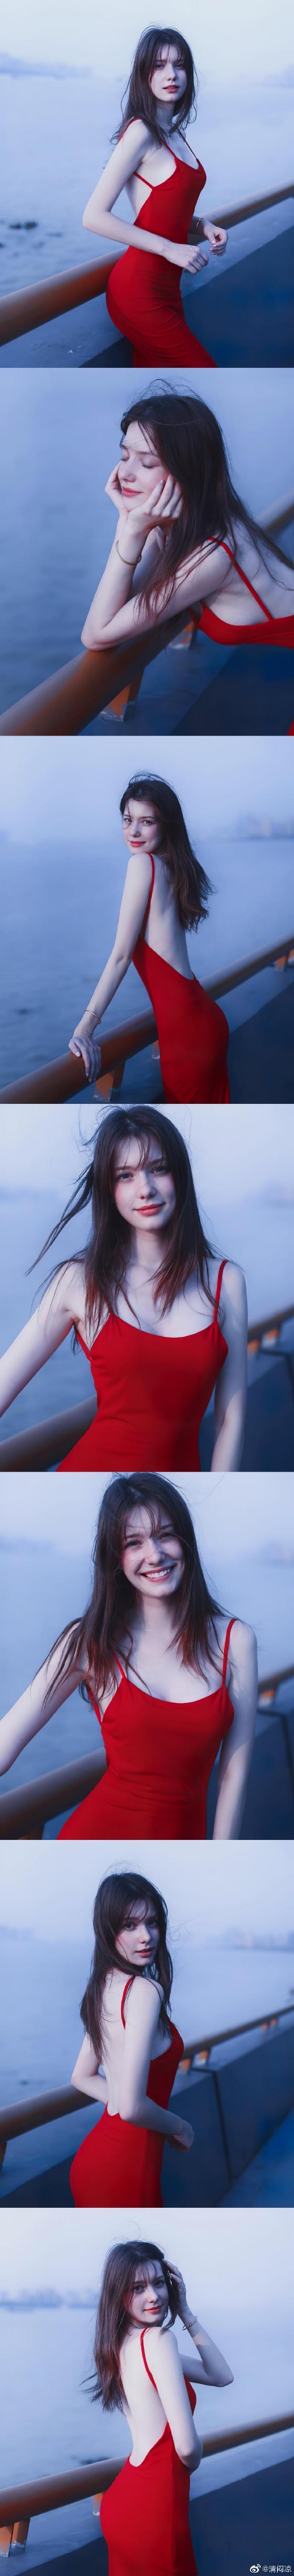 白俄罗斯模特Anastasia Cebulska